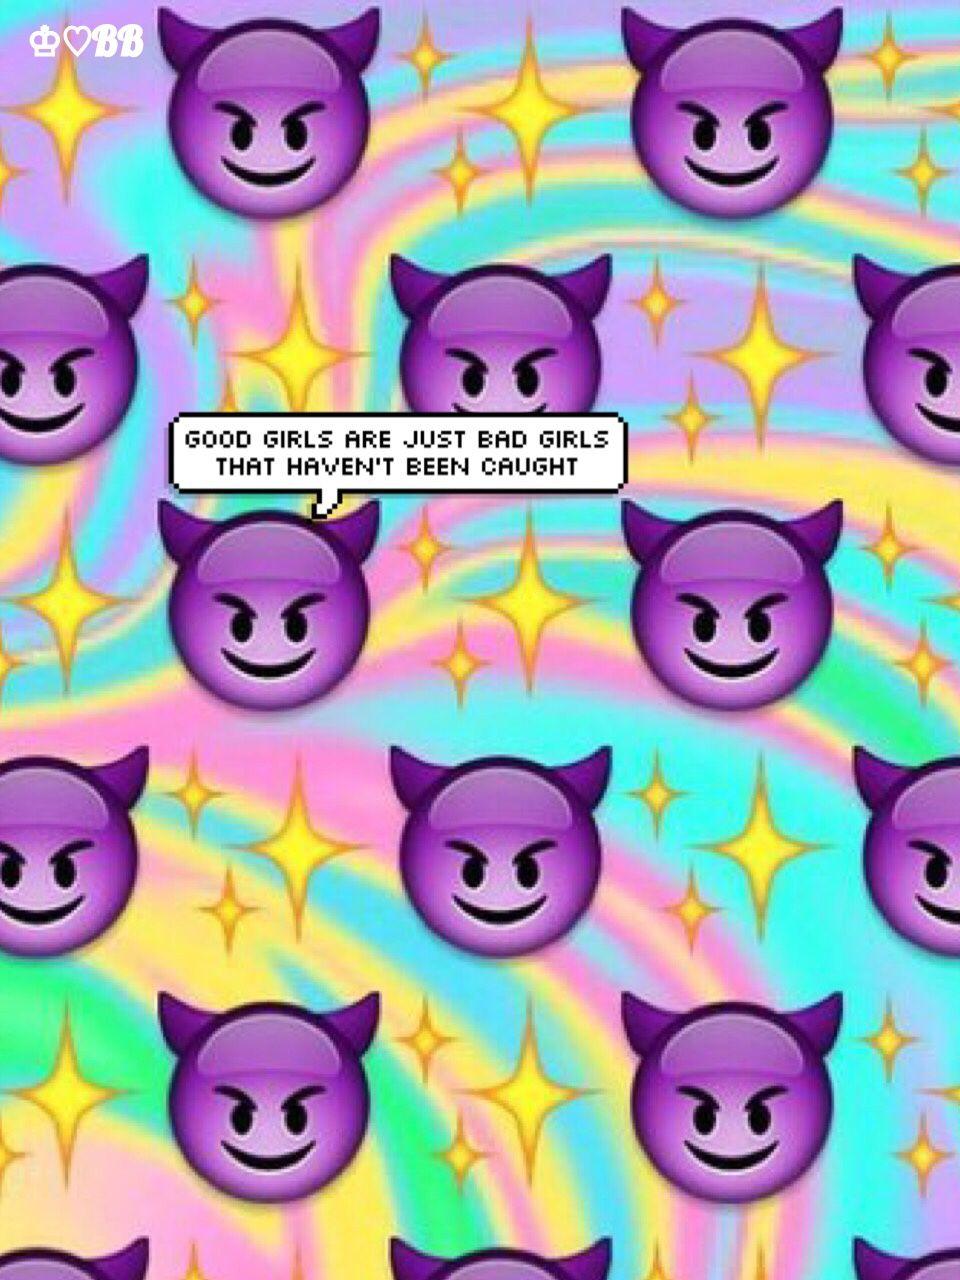 Iphone icon wallpaper tumblr - Purple Devil Emoji Tumblr